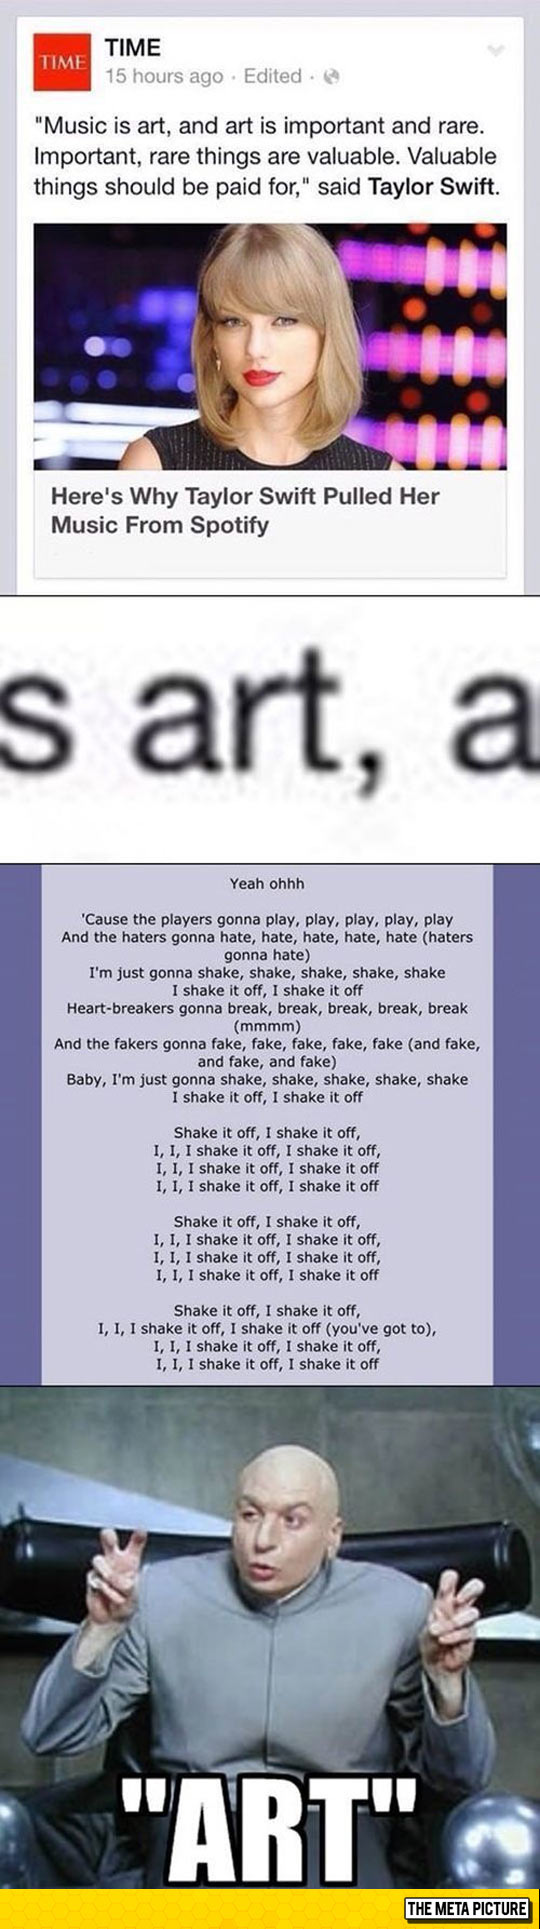 Taylor Swift Talking About Art